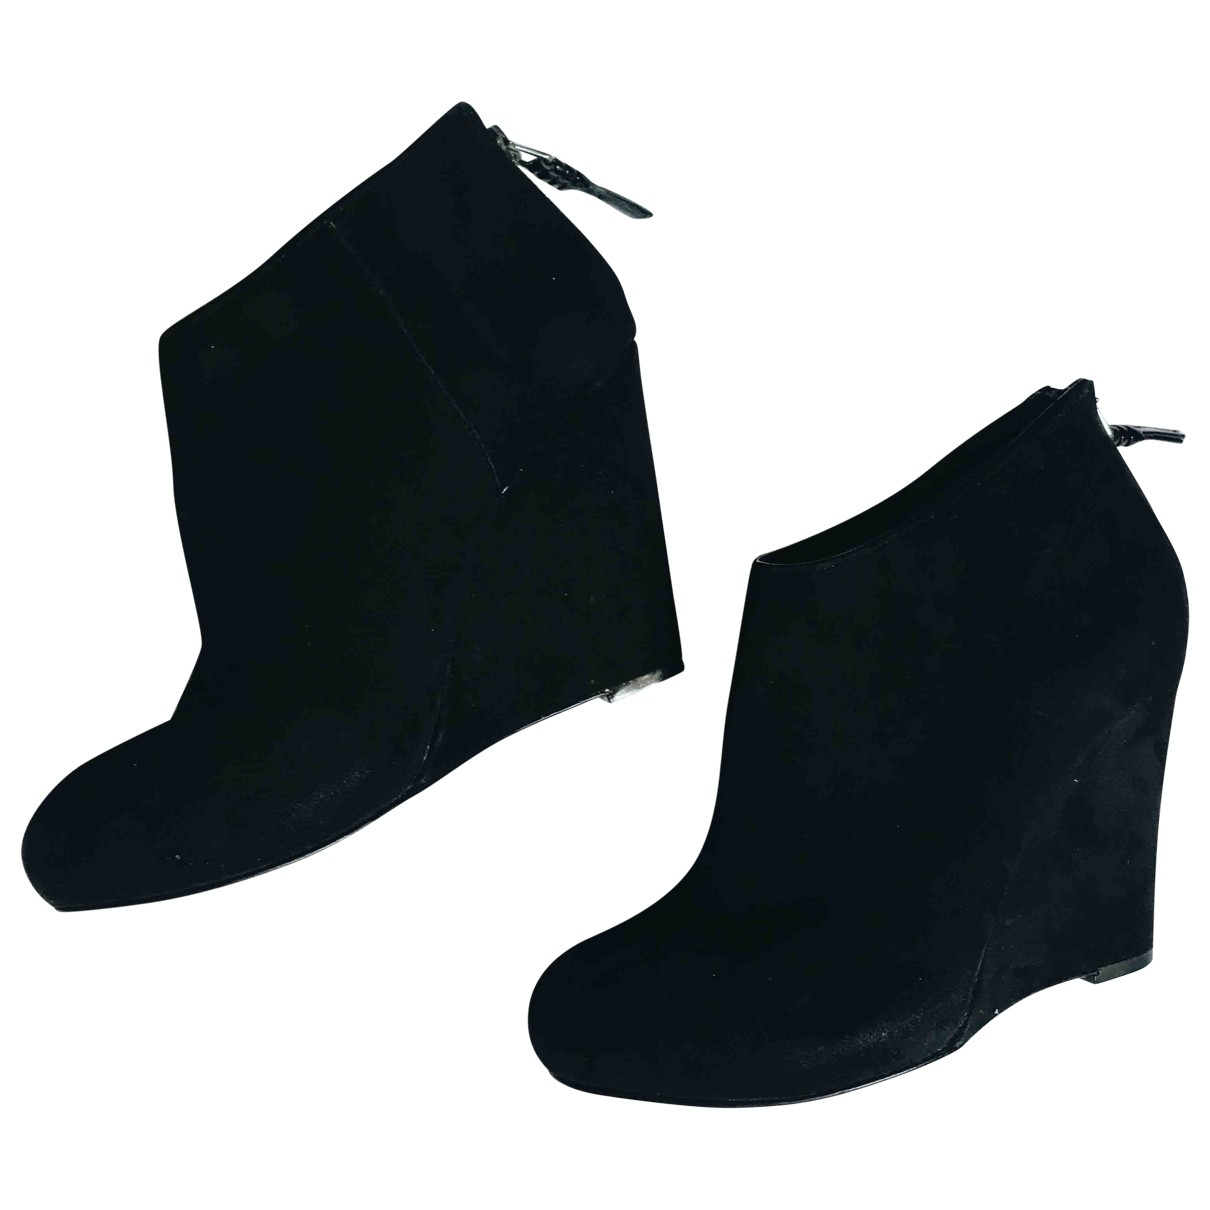 Dkny \N Black Suede Heels for Women 36 EU